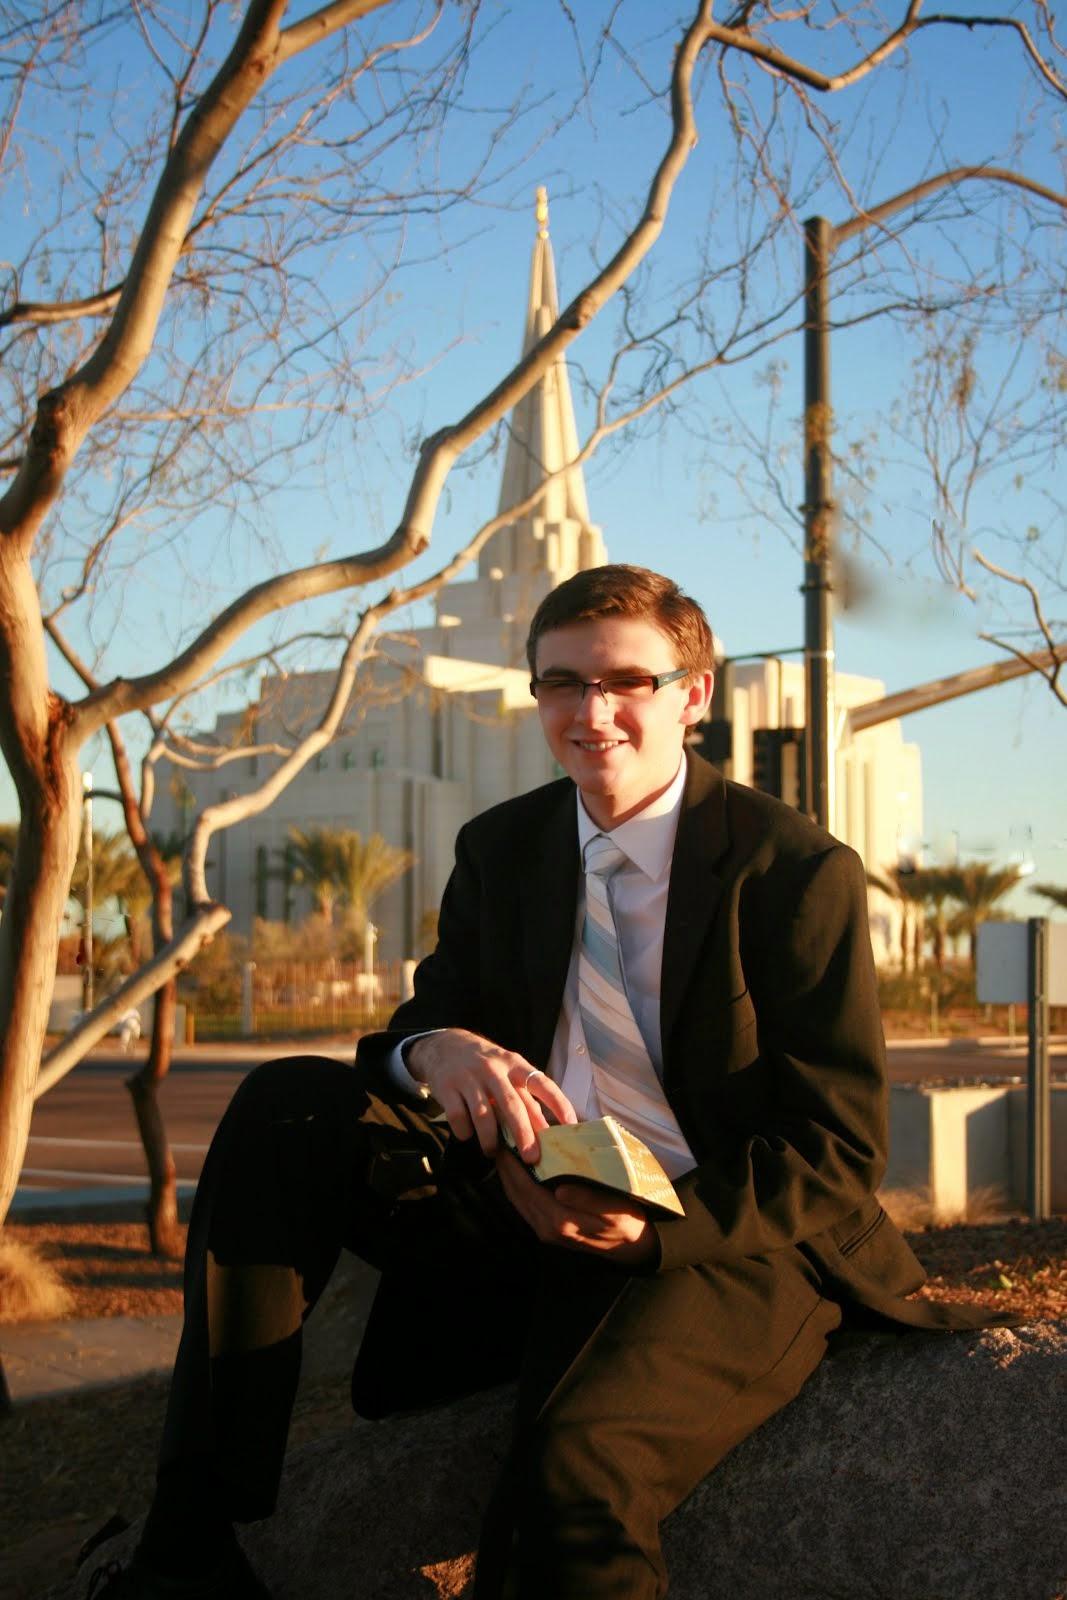 Elder Porter Pennington